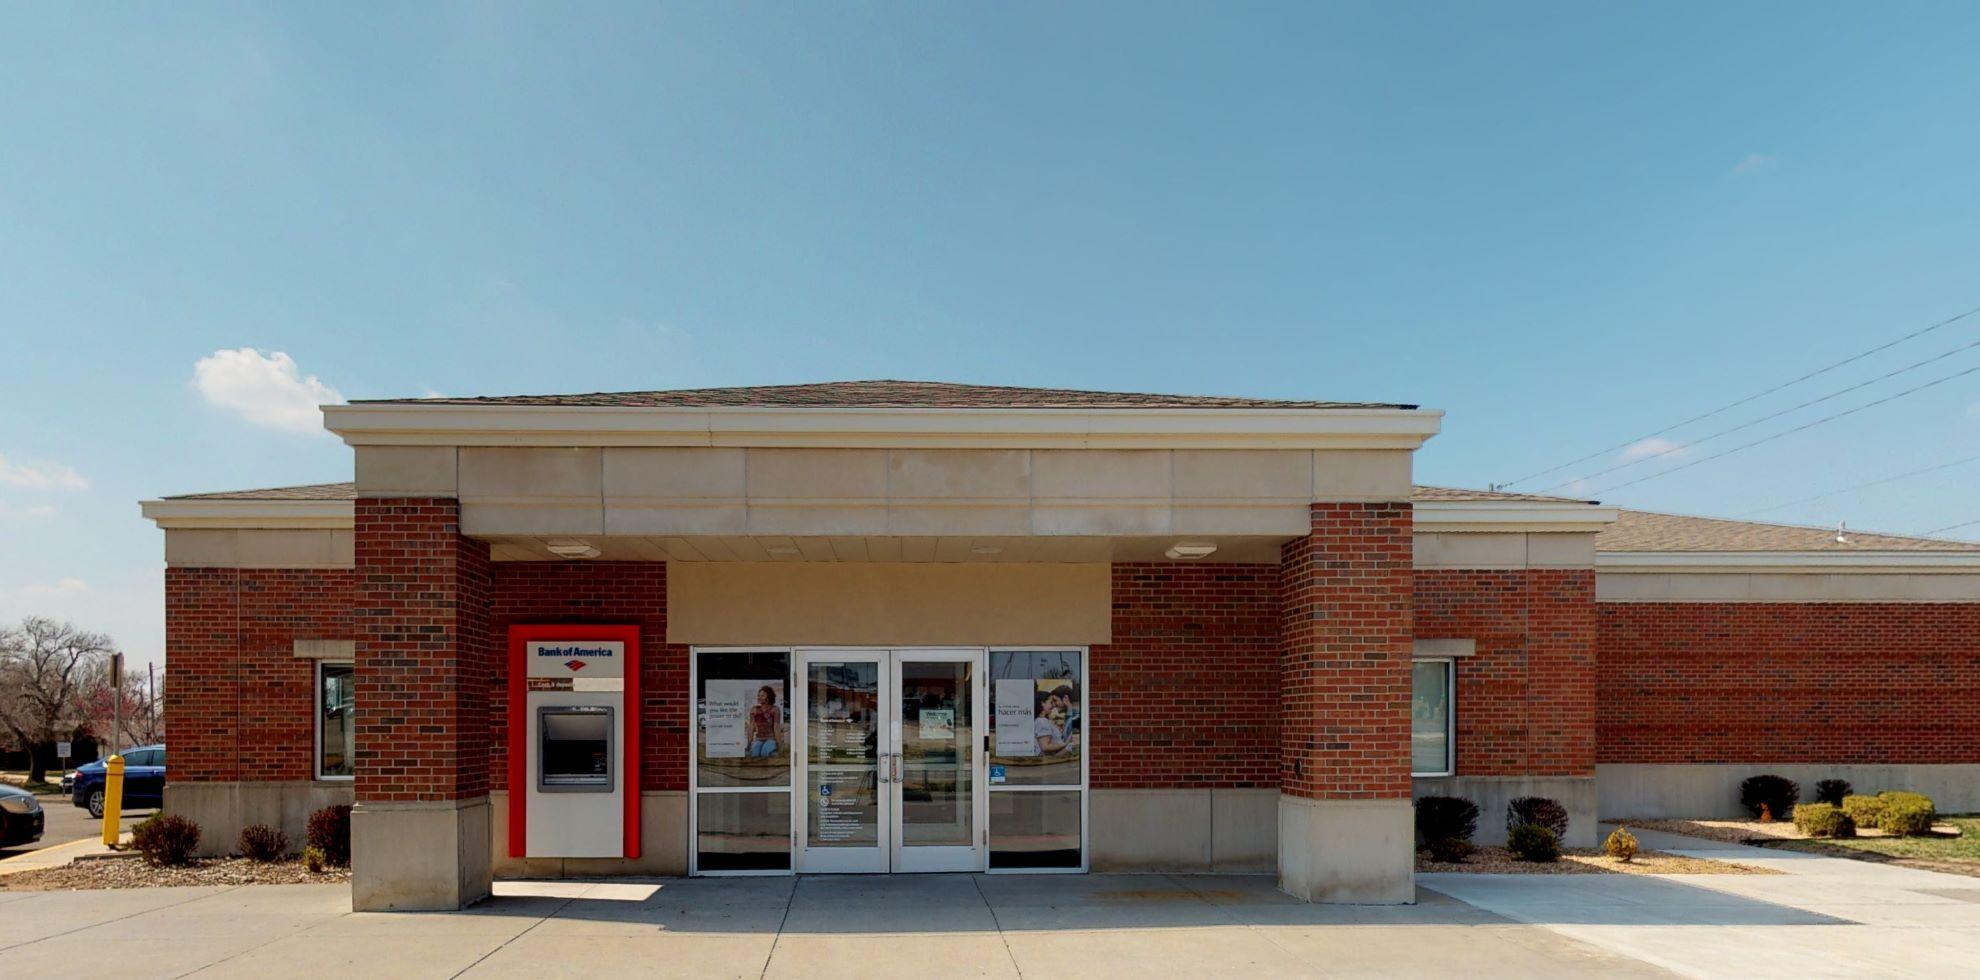 Bank of America financial center with drive-thru ATM   2151 N Hillside St, Wichita, KS 67214